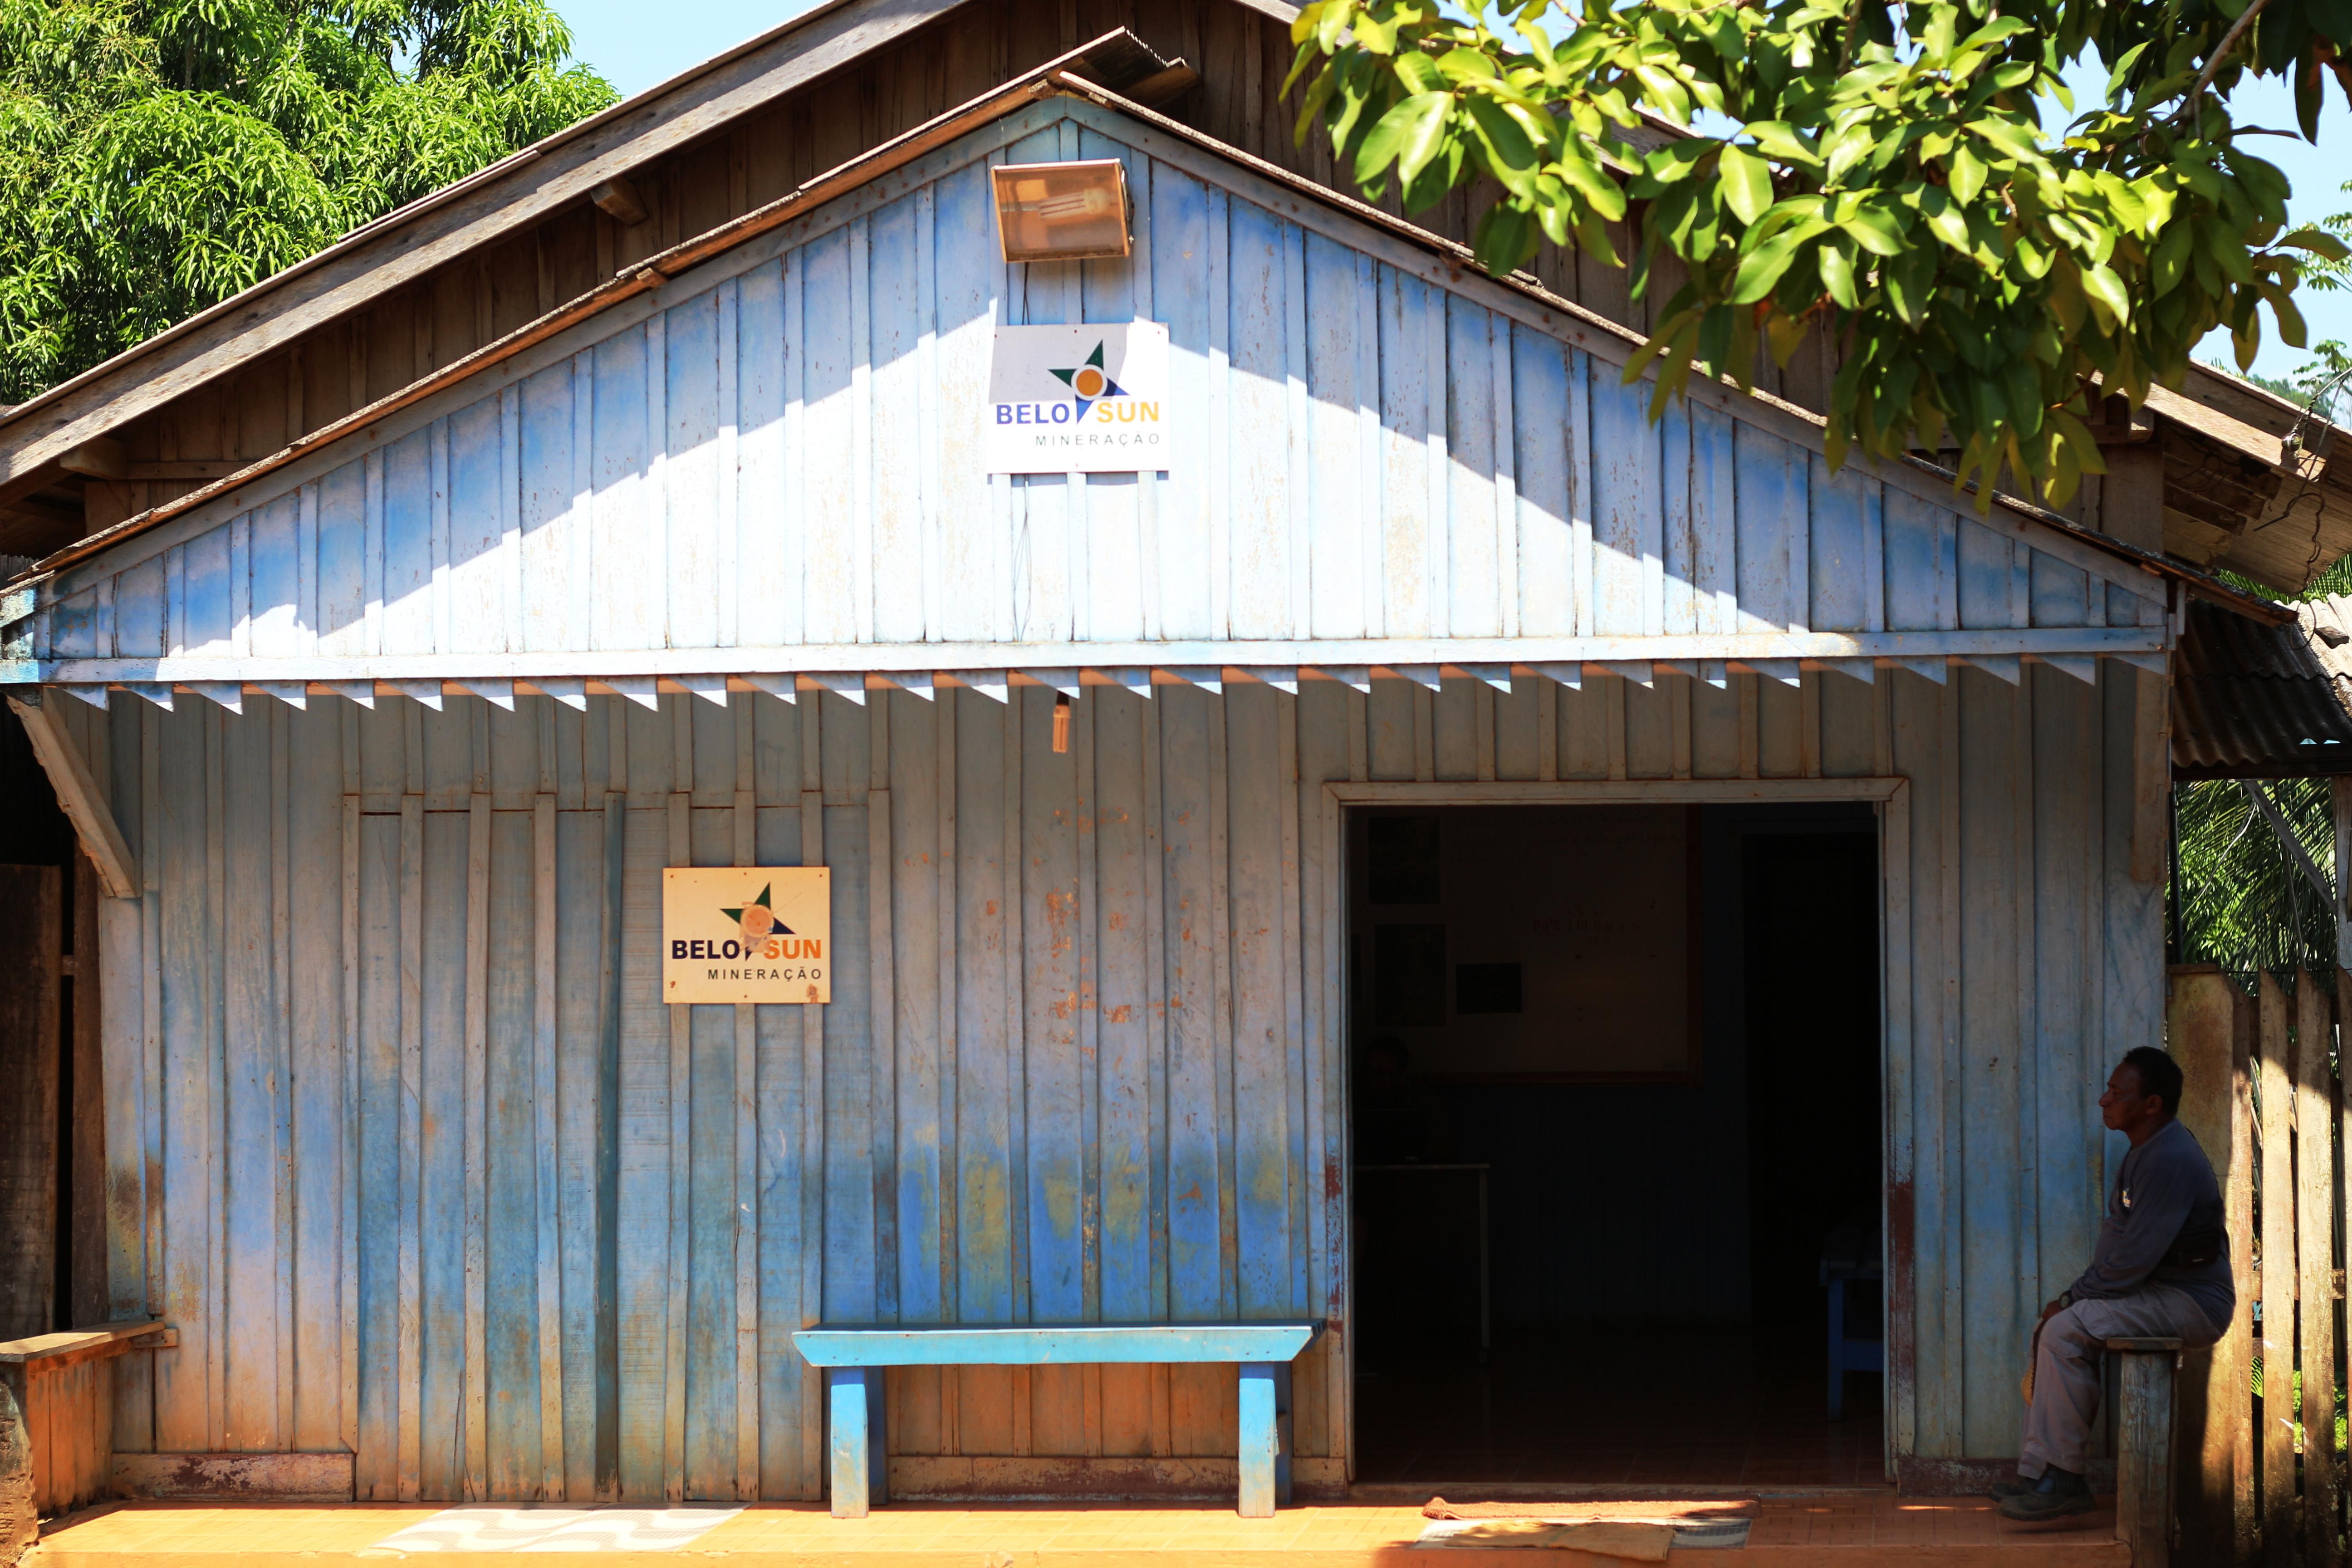 Local office of Belo Sun at Vila Ressaca, Big Bend of the Xingu River